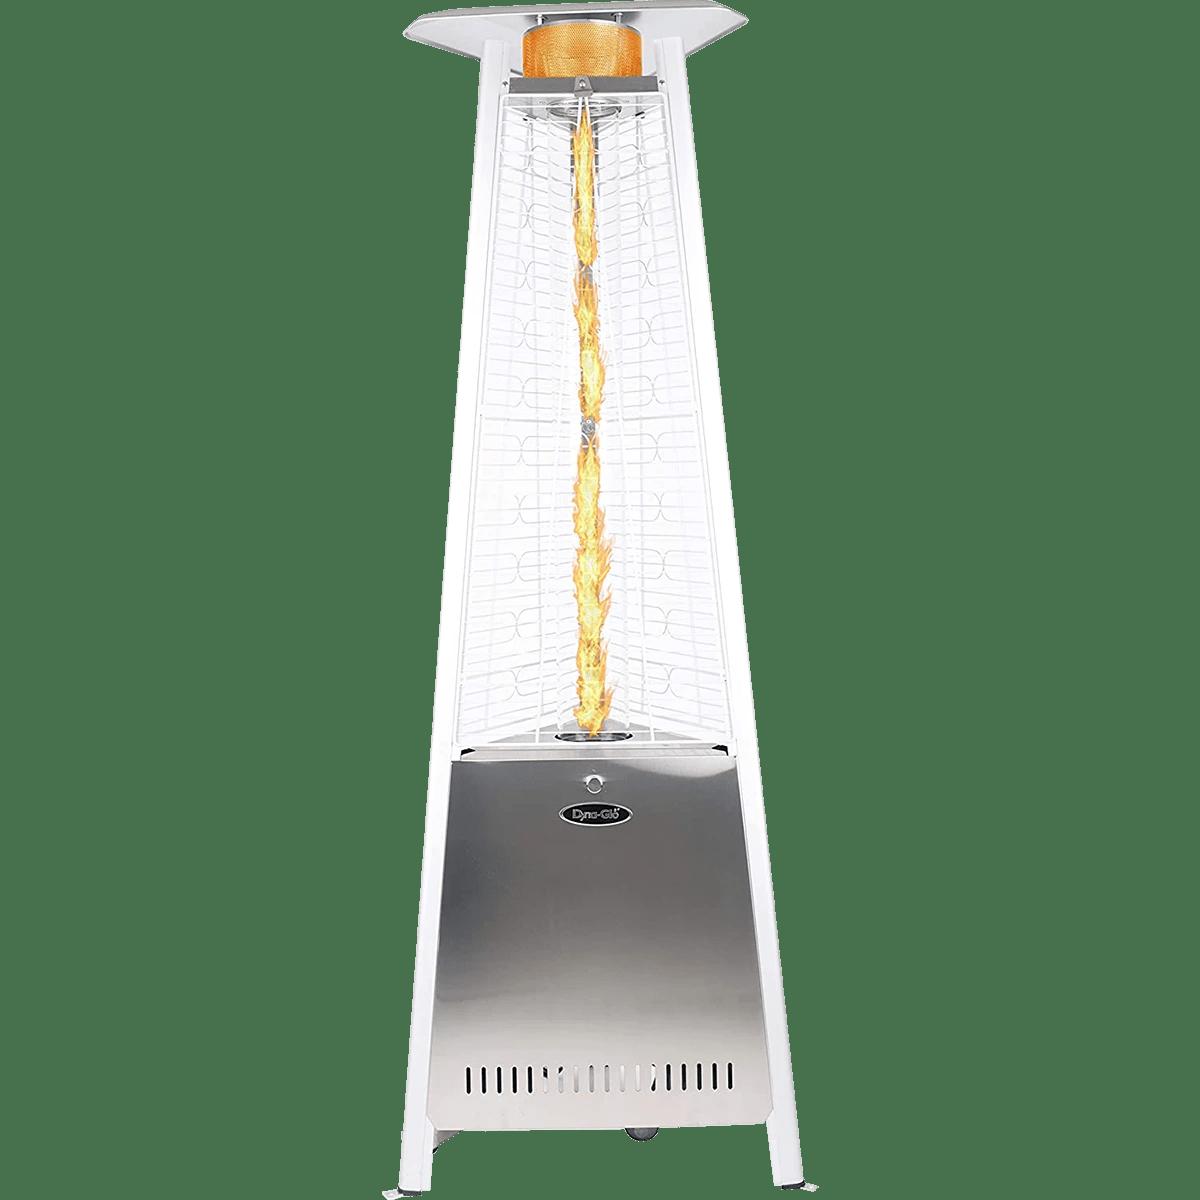 dyna glo 42 000 btu 73 stainless steel pyramid flame patio heater